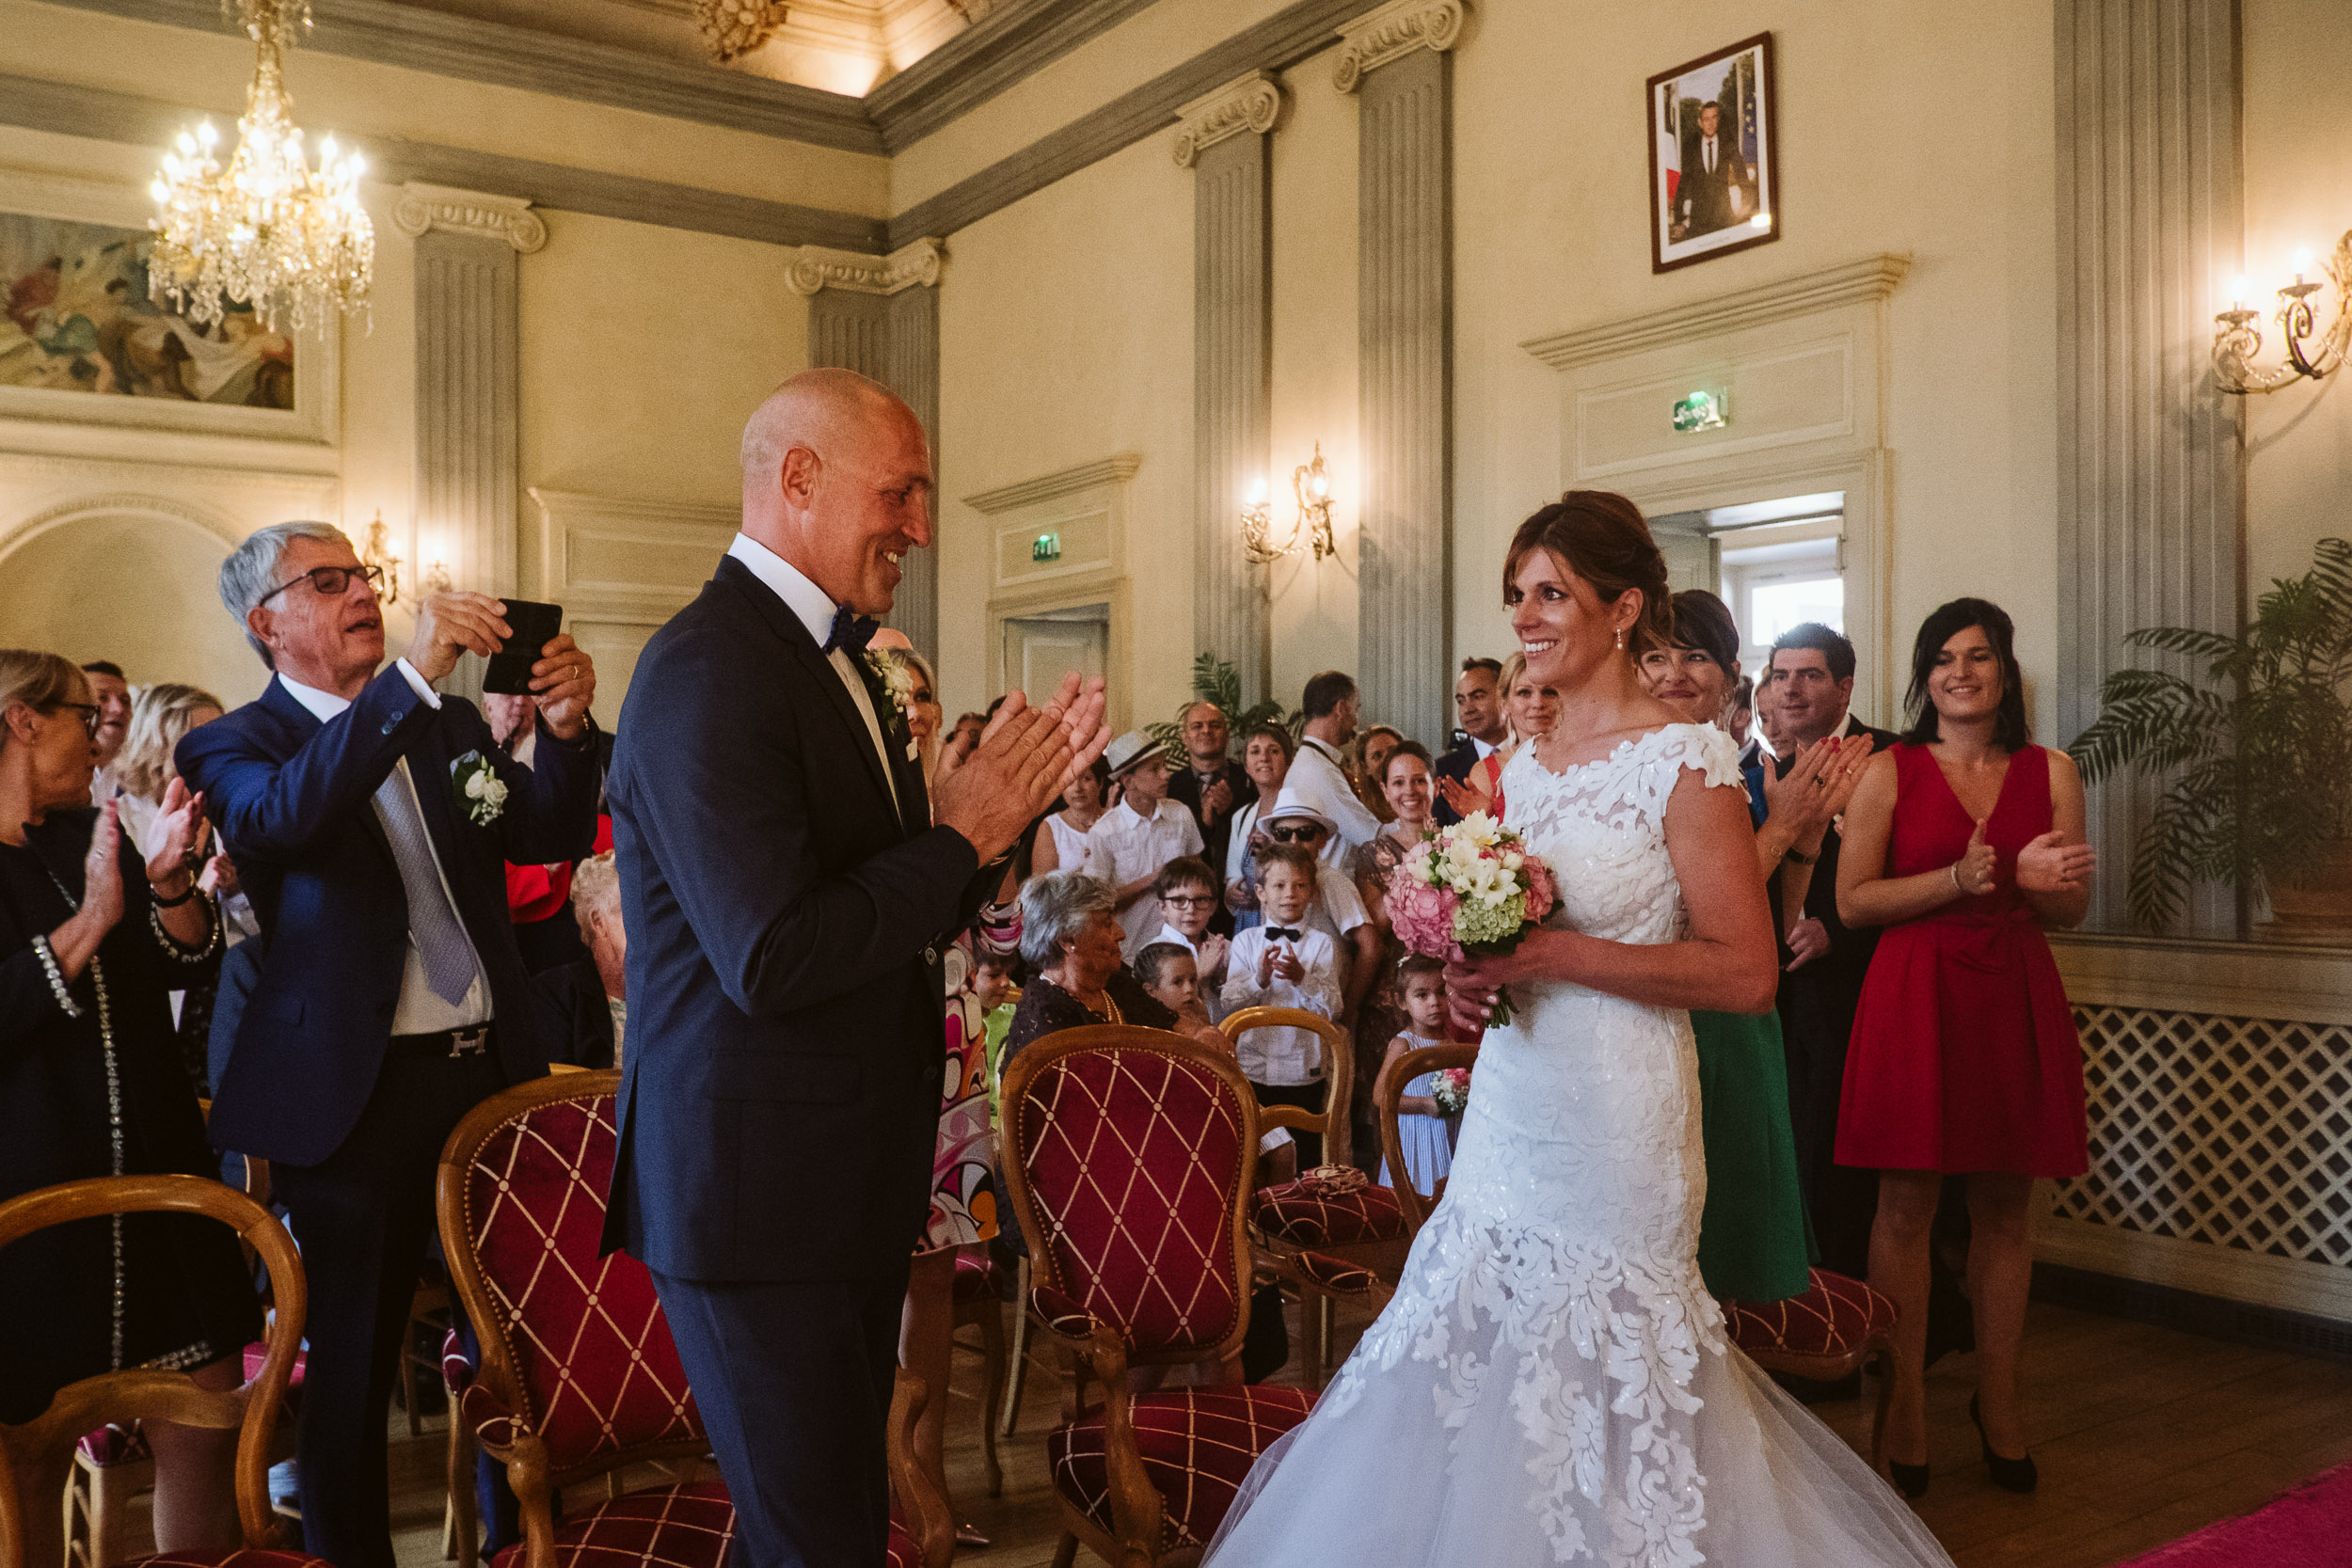 gerald-mattel-photographe-mariage-sallanches-5.jpg